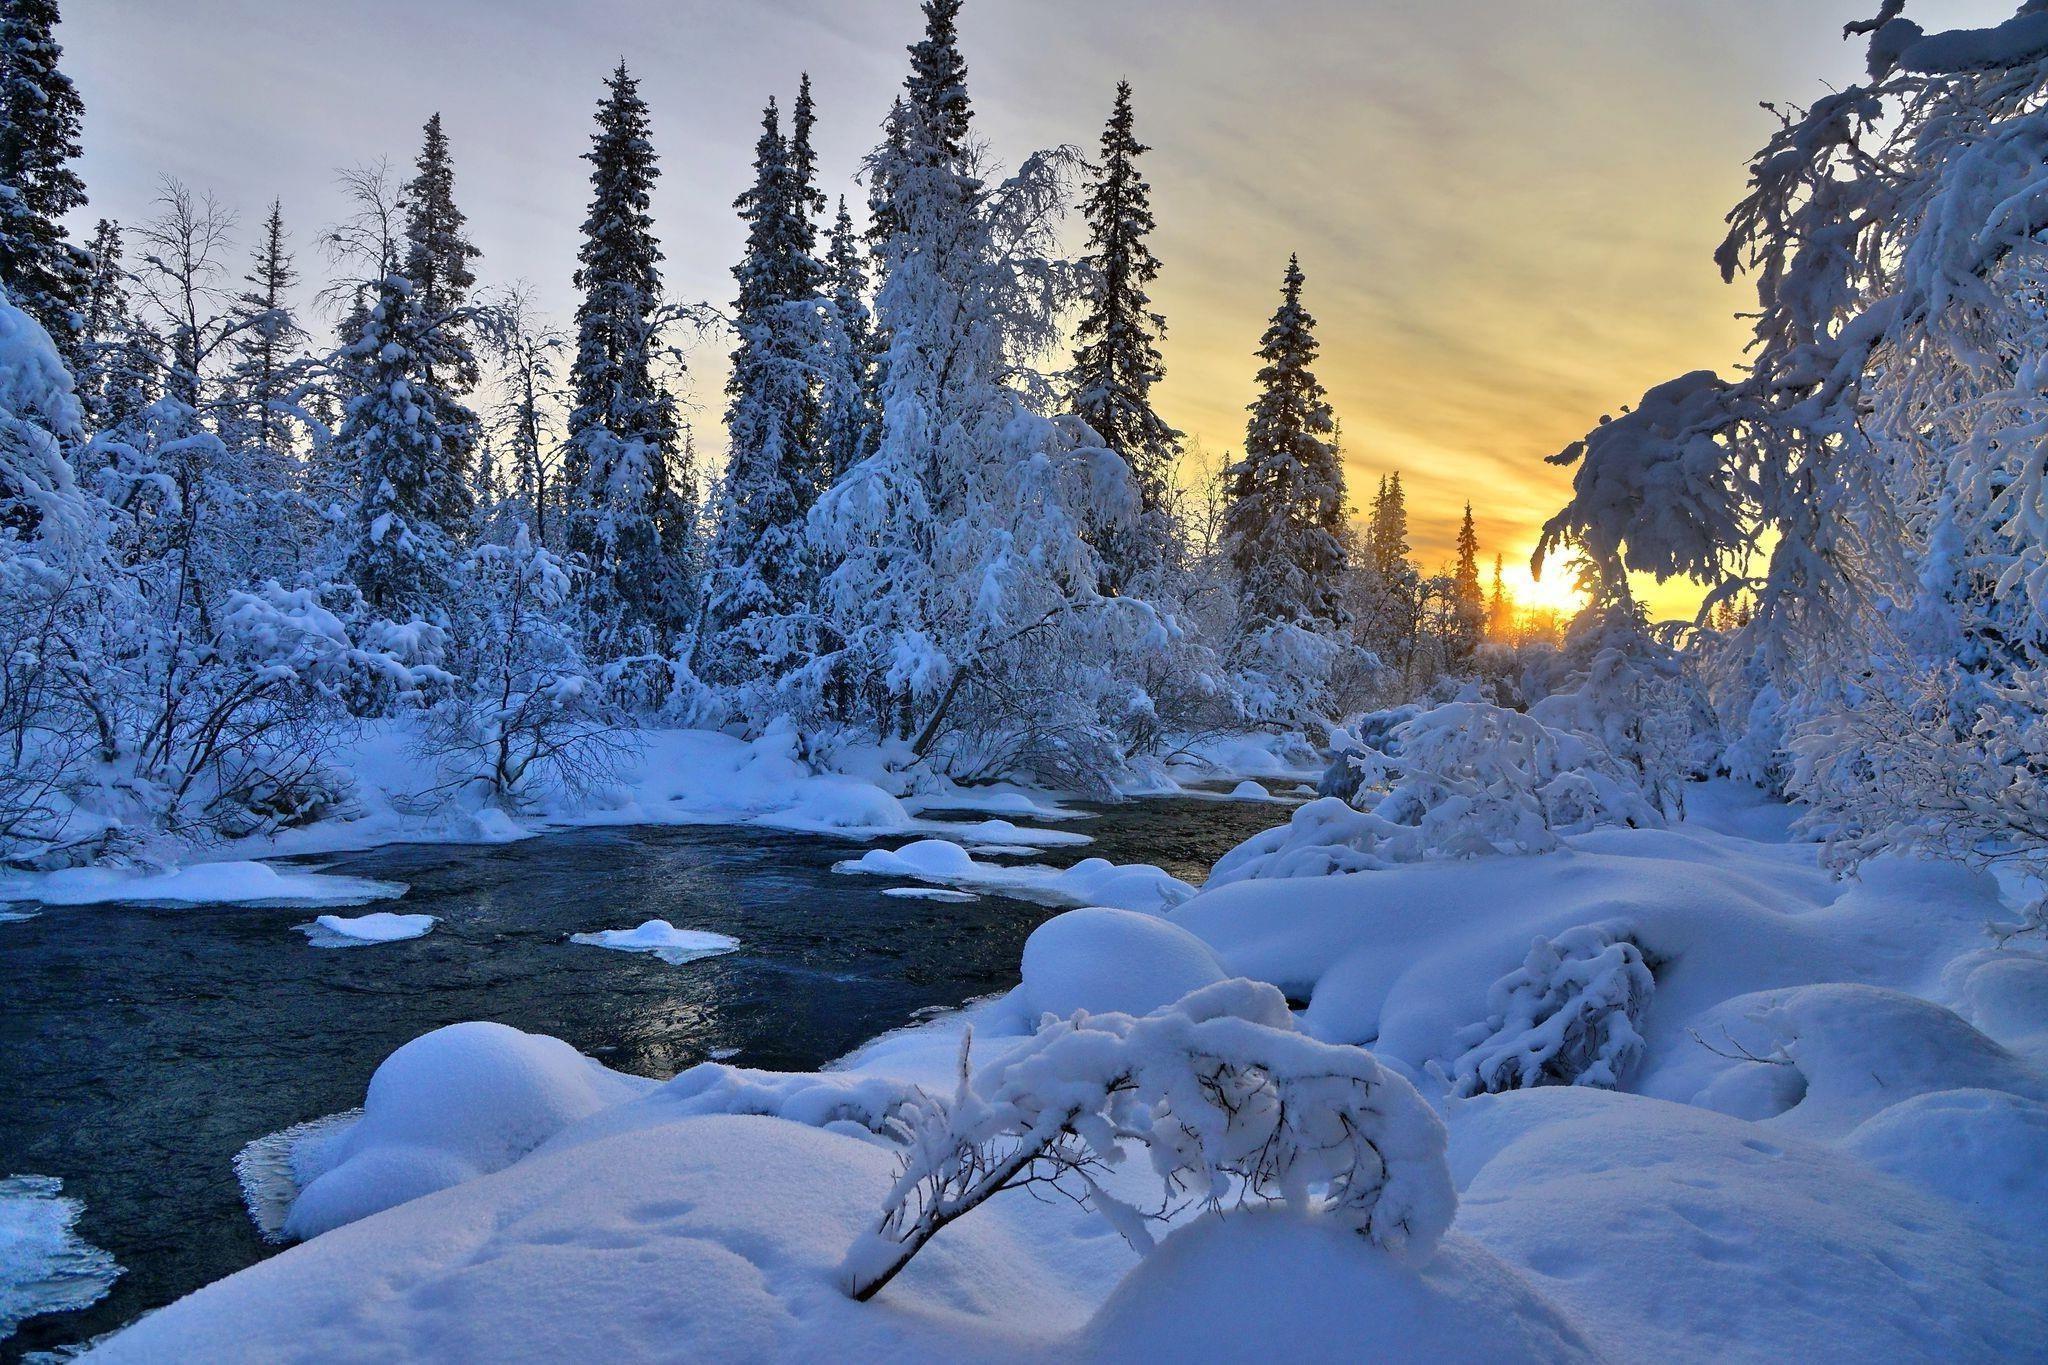 Winter River Nature Trees Landscape 1080p - Hd Winter Landscape Wallpapers 1080p - HD Wallpaper